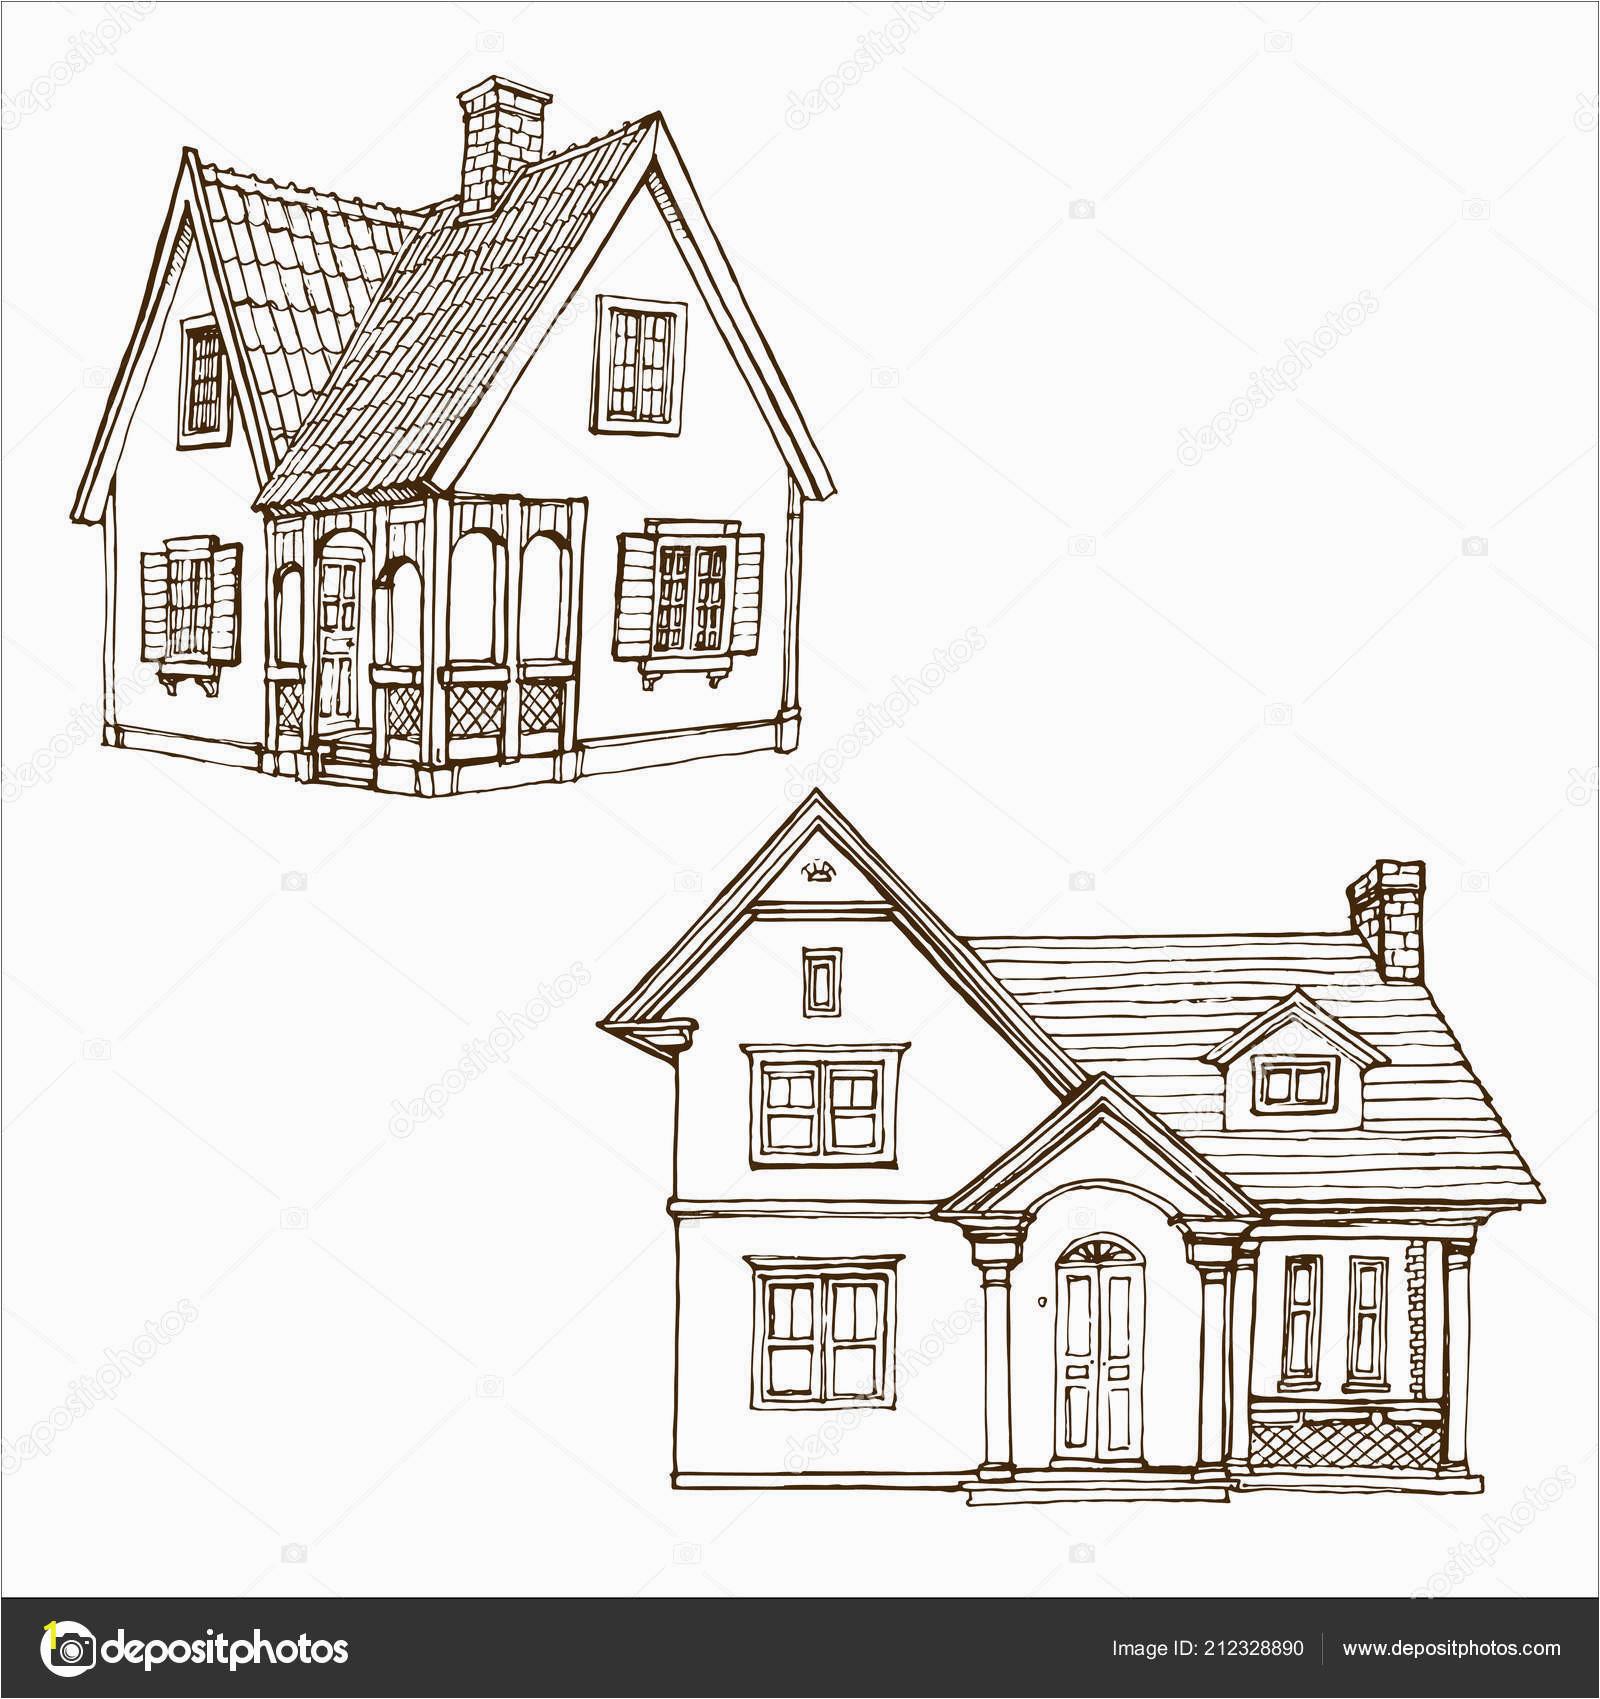 depositphotos stock illustration victorian cute little houses set